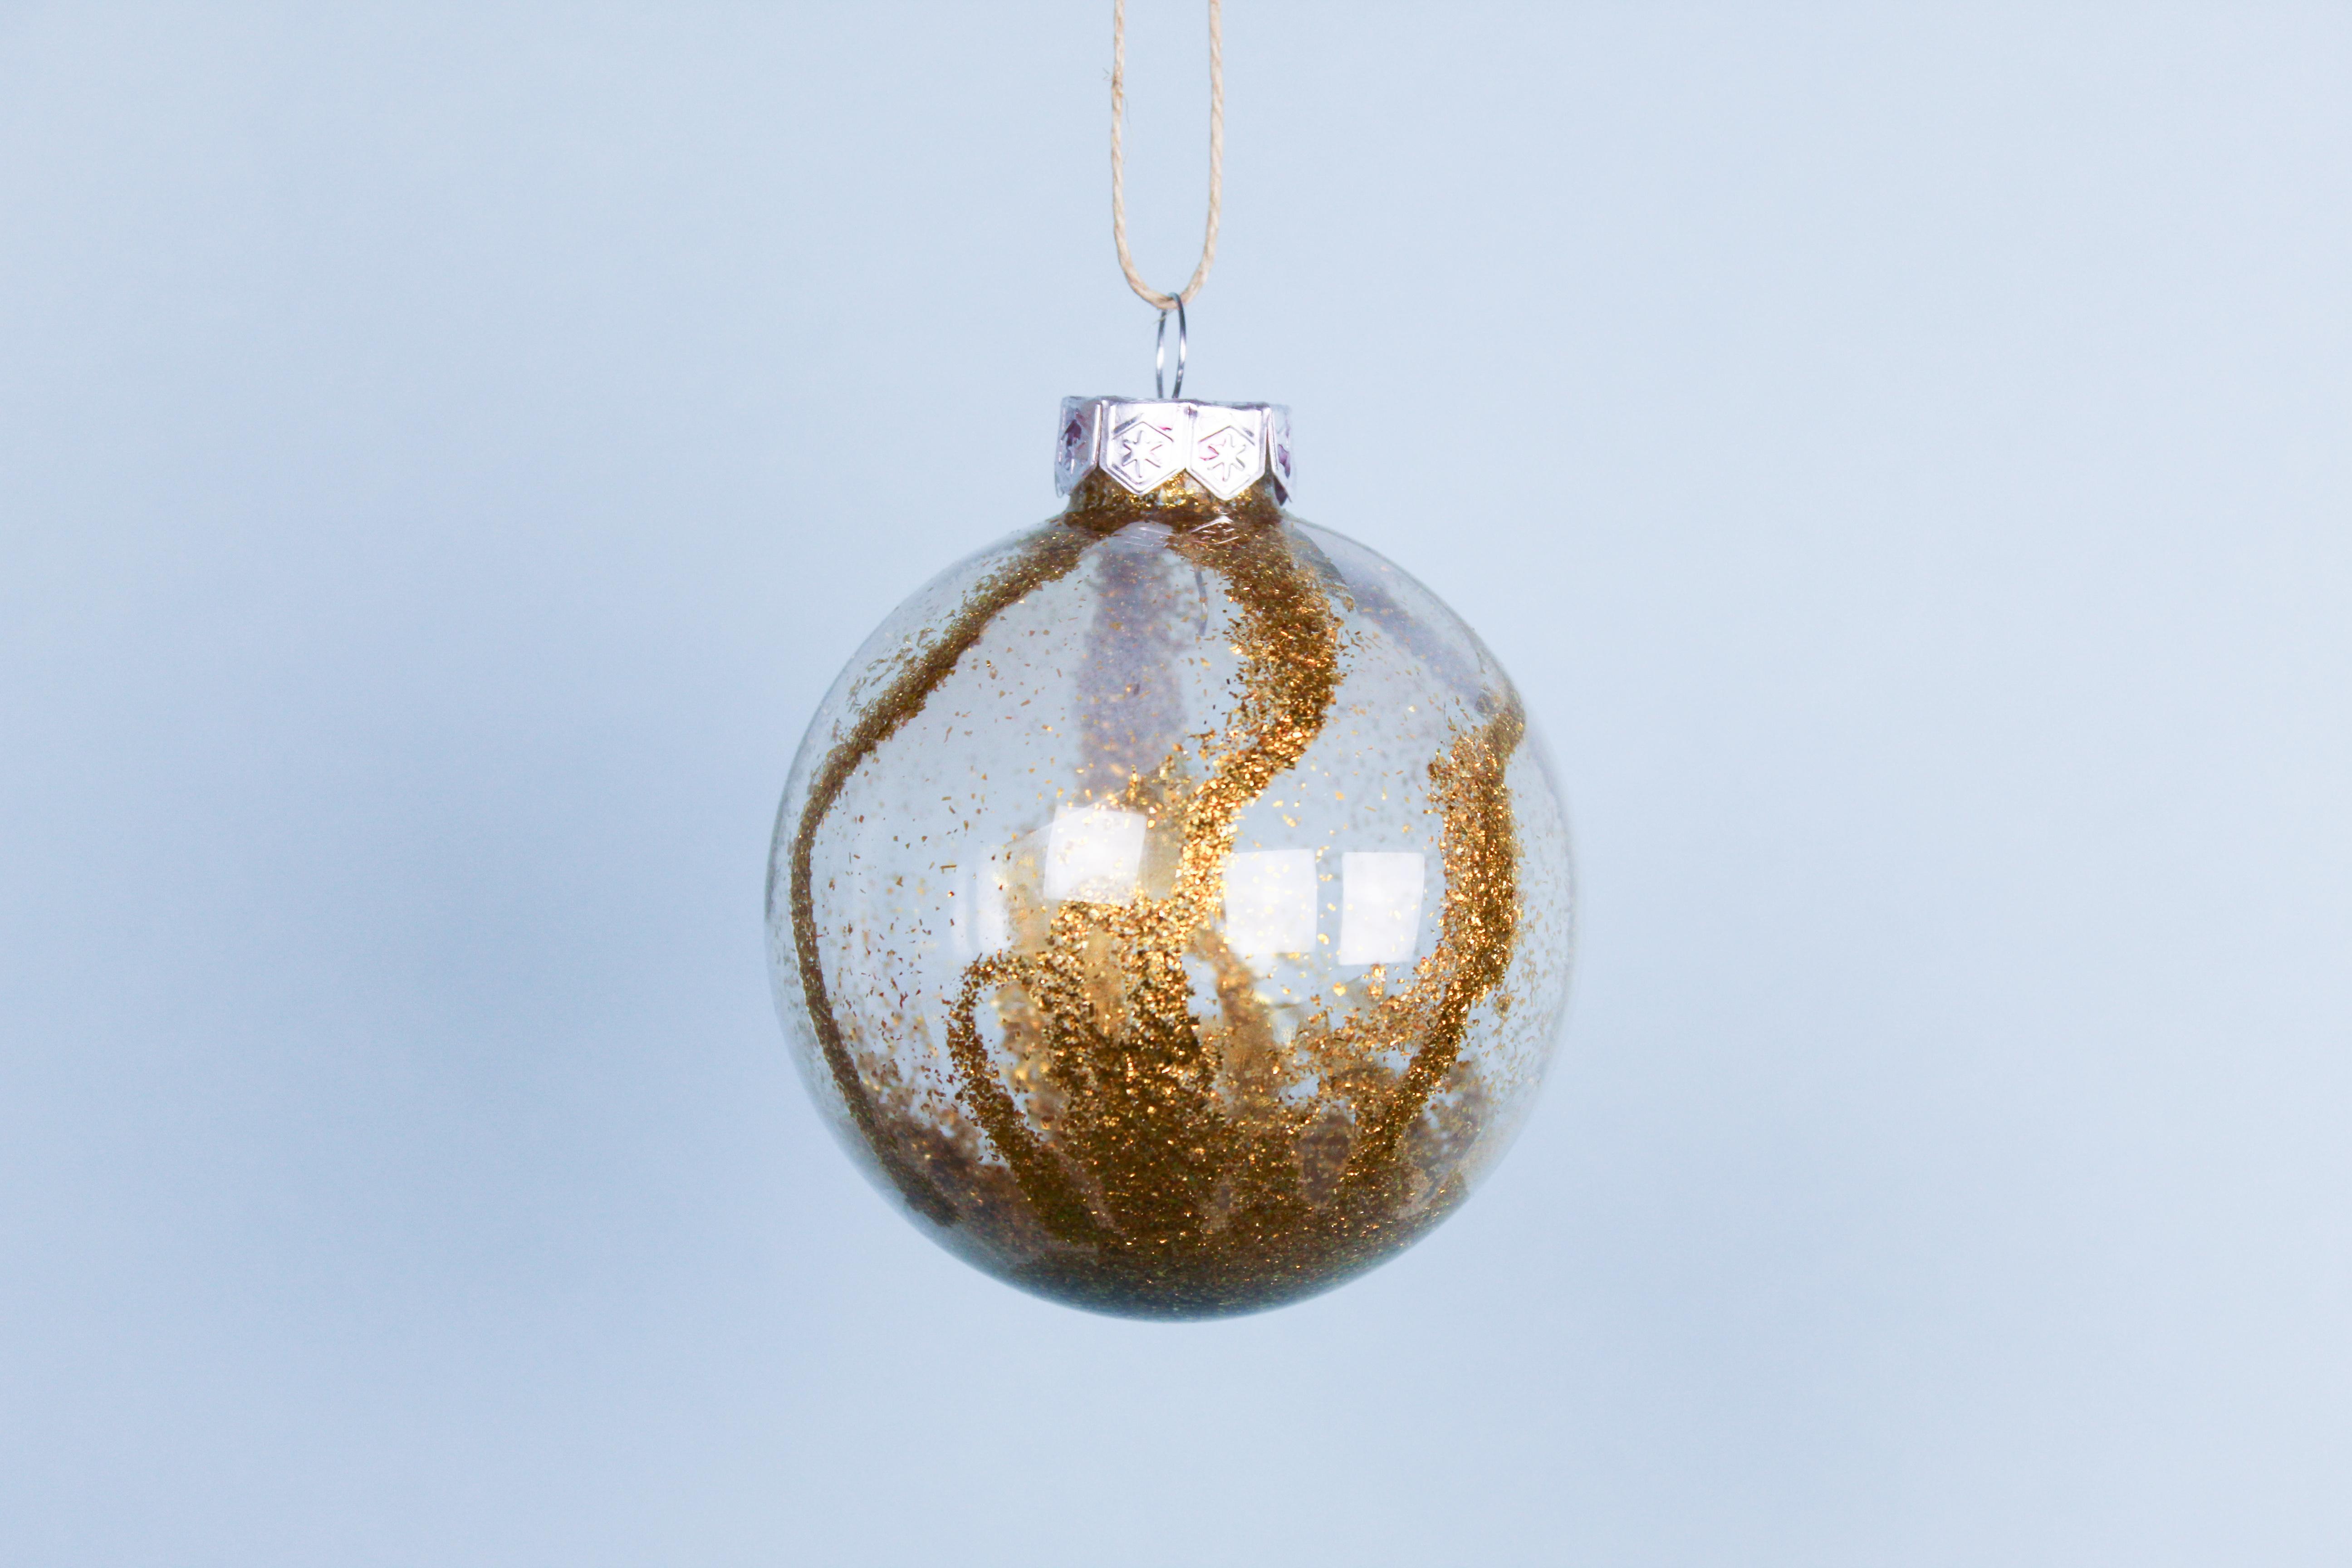 kerstbal-met-glitters